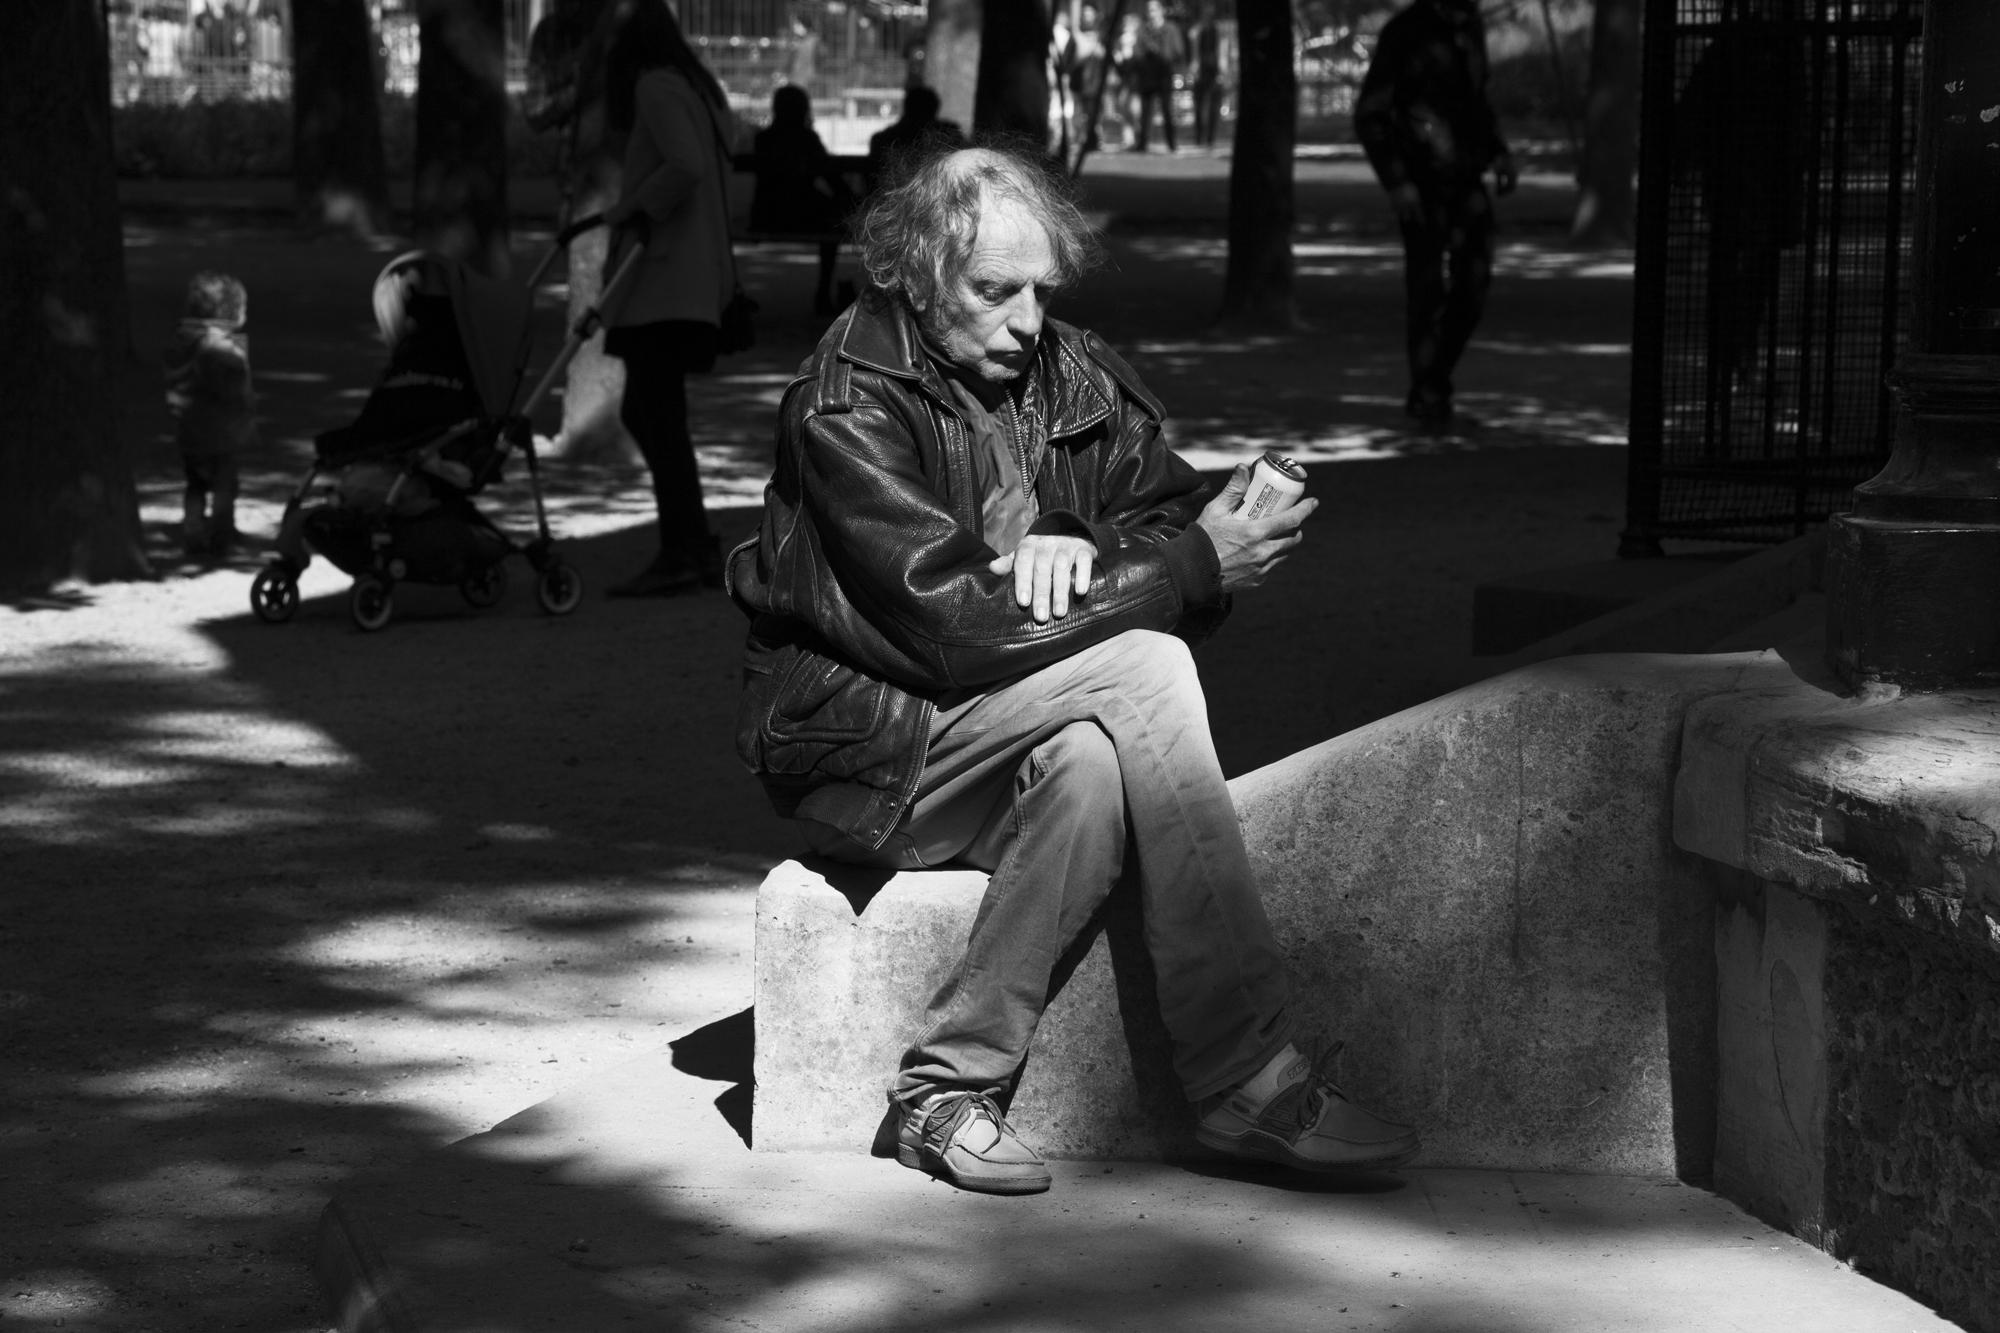 """Meet with the sun"" - Jardin du Luxembourg, Paris (2017). © Clémence Rougetet"